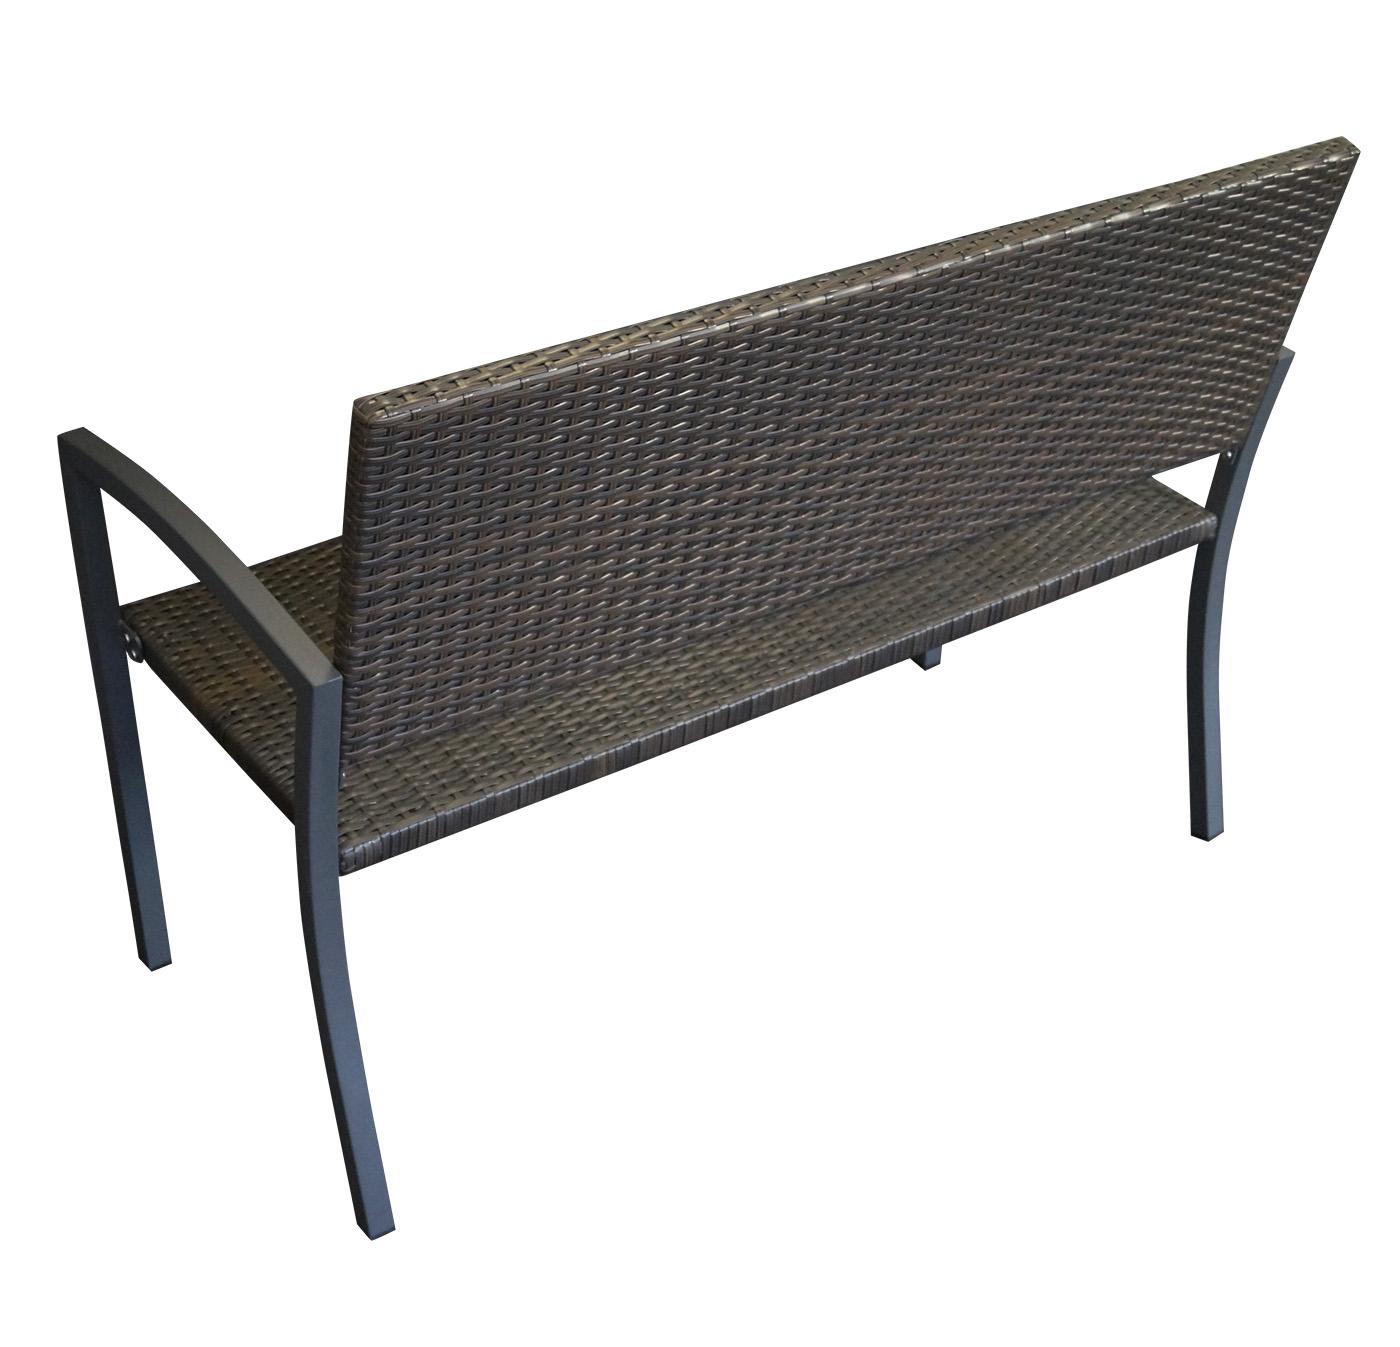 gartenbank rattanbank gartenm bel bank toledo stahl. Black Bedroom Furniture Sets. Home Design Ideas